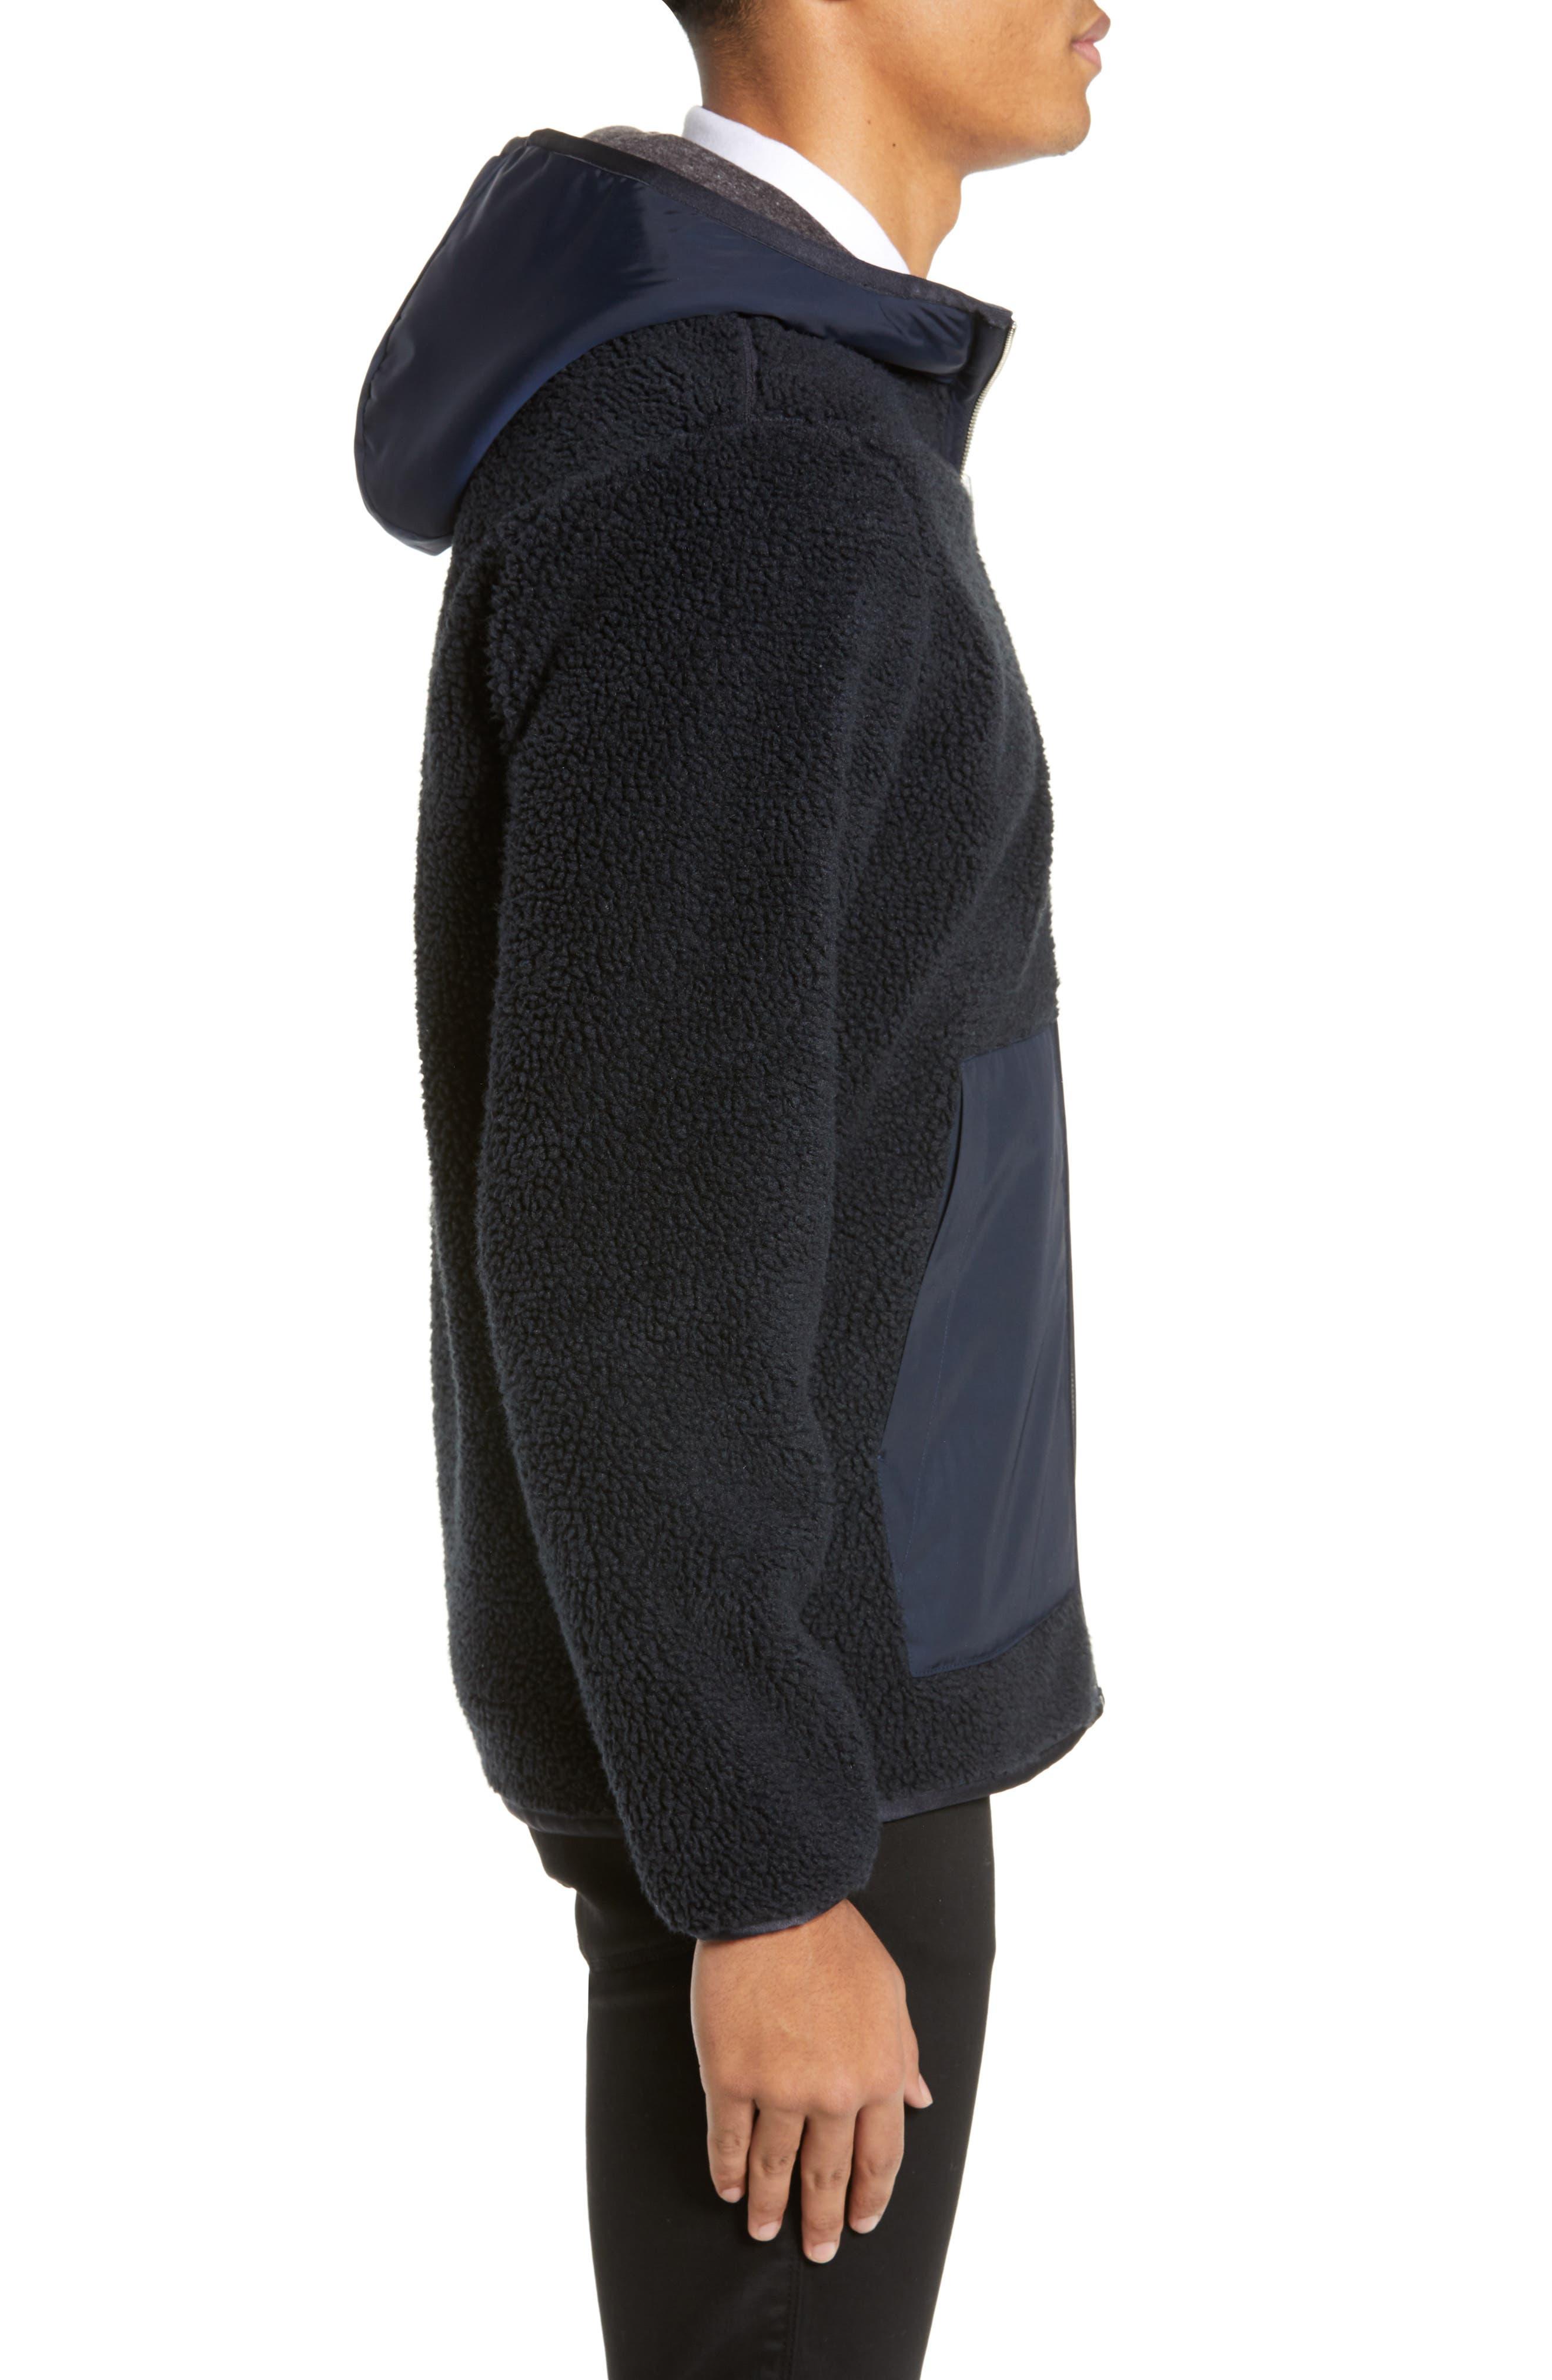 THEORY, Polar Fleece Reversible Zip Hoodie, Alternate thumbnail 5, color, 476